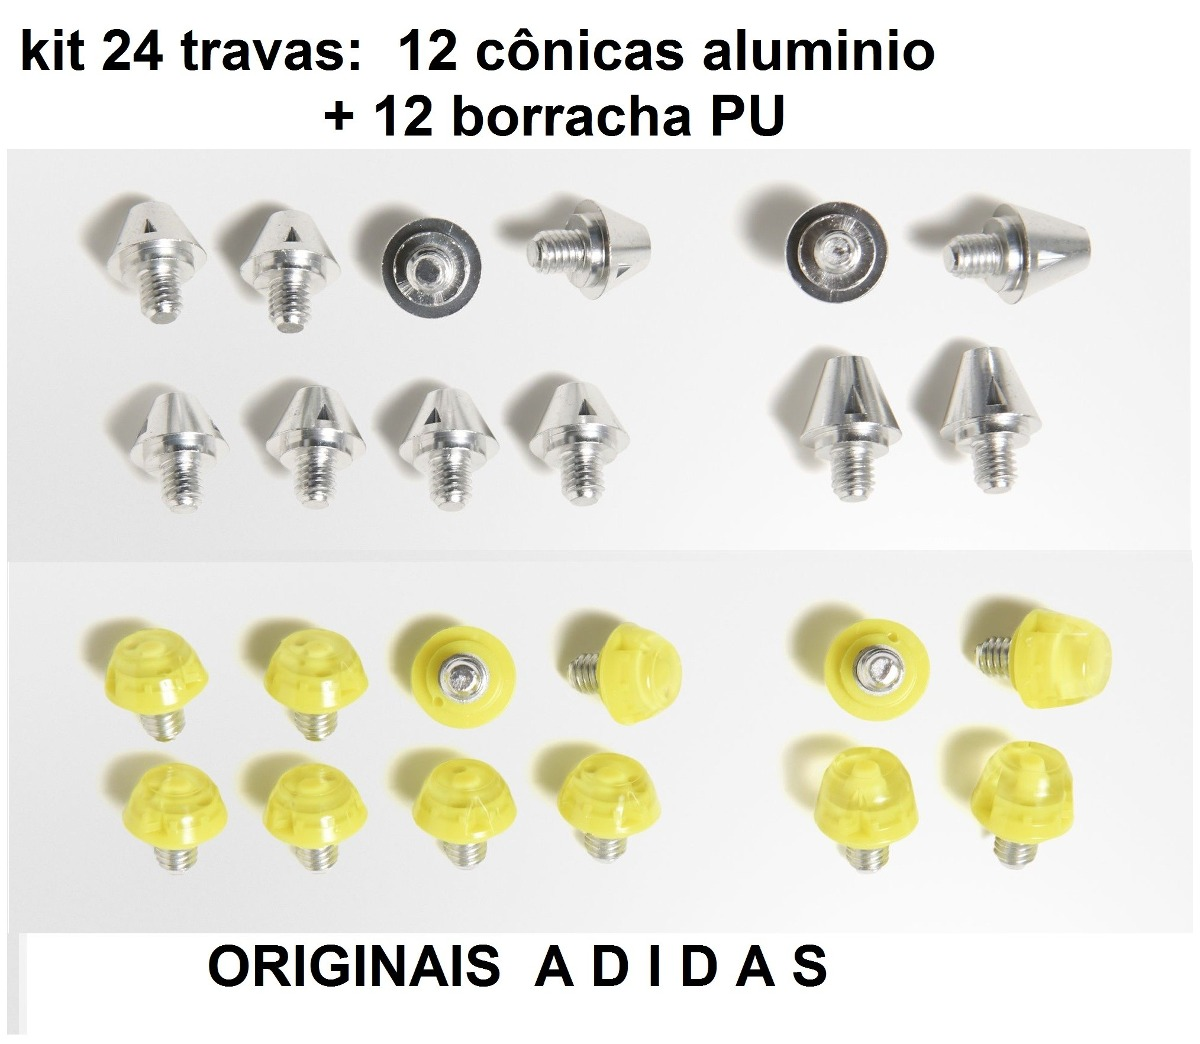 25dac42f9322e Jogo 24 Travas Borracha Sg adidas F50 11pro Predator 1magnus - R ...